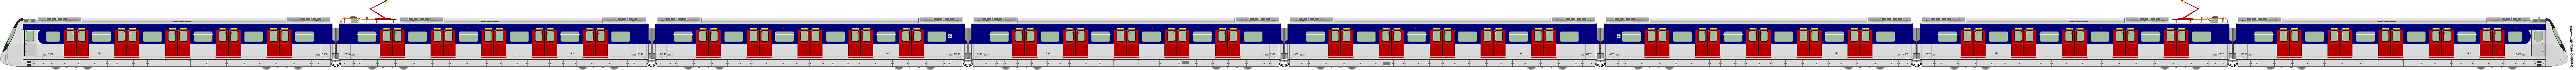 [5549] MTR 5549